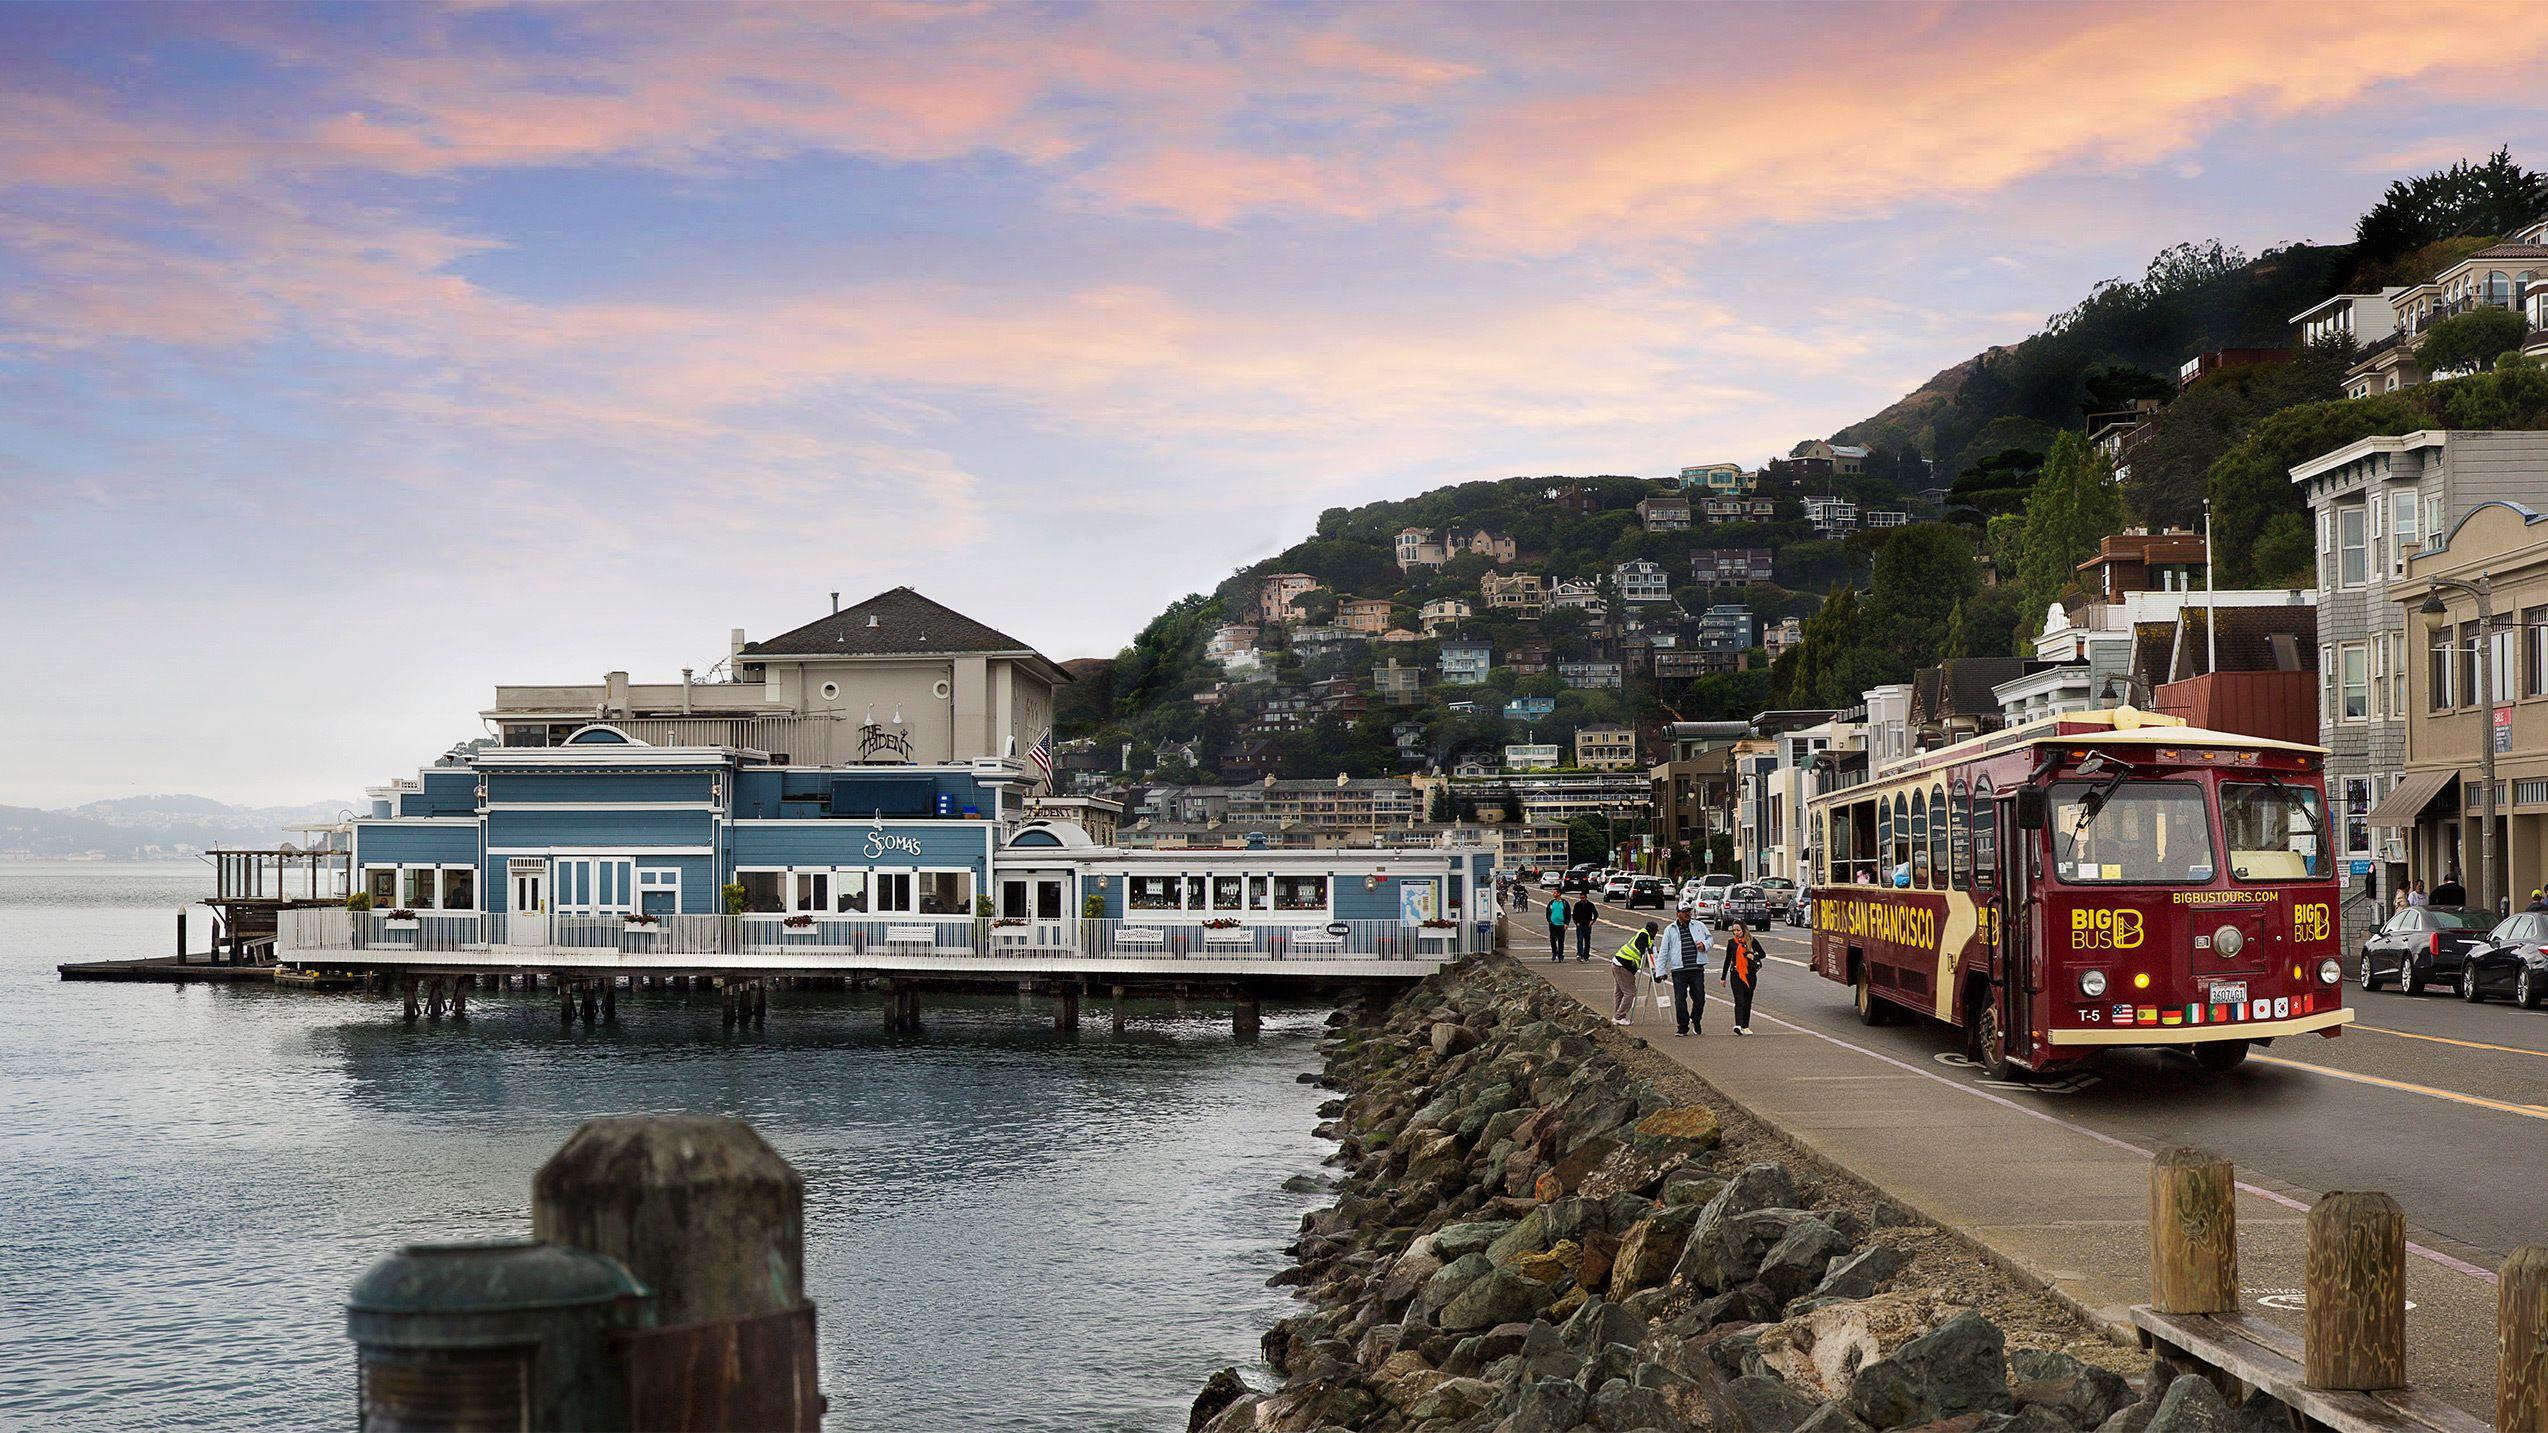 Big Bus tour on the coastline in San Francisco